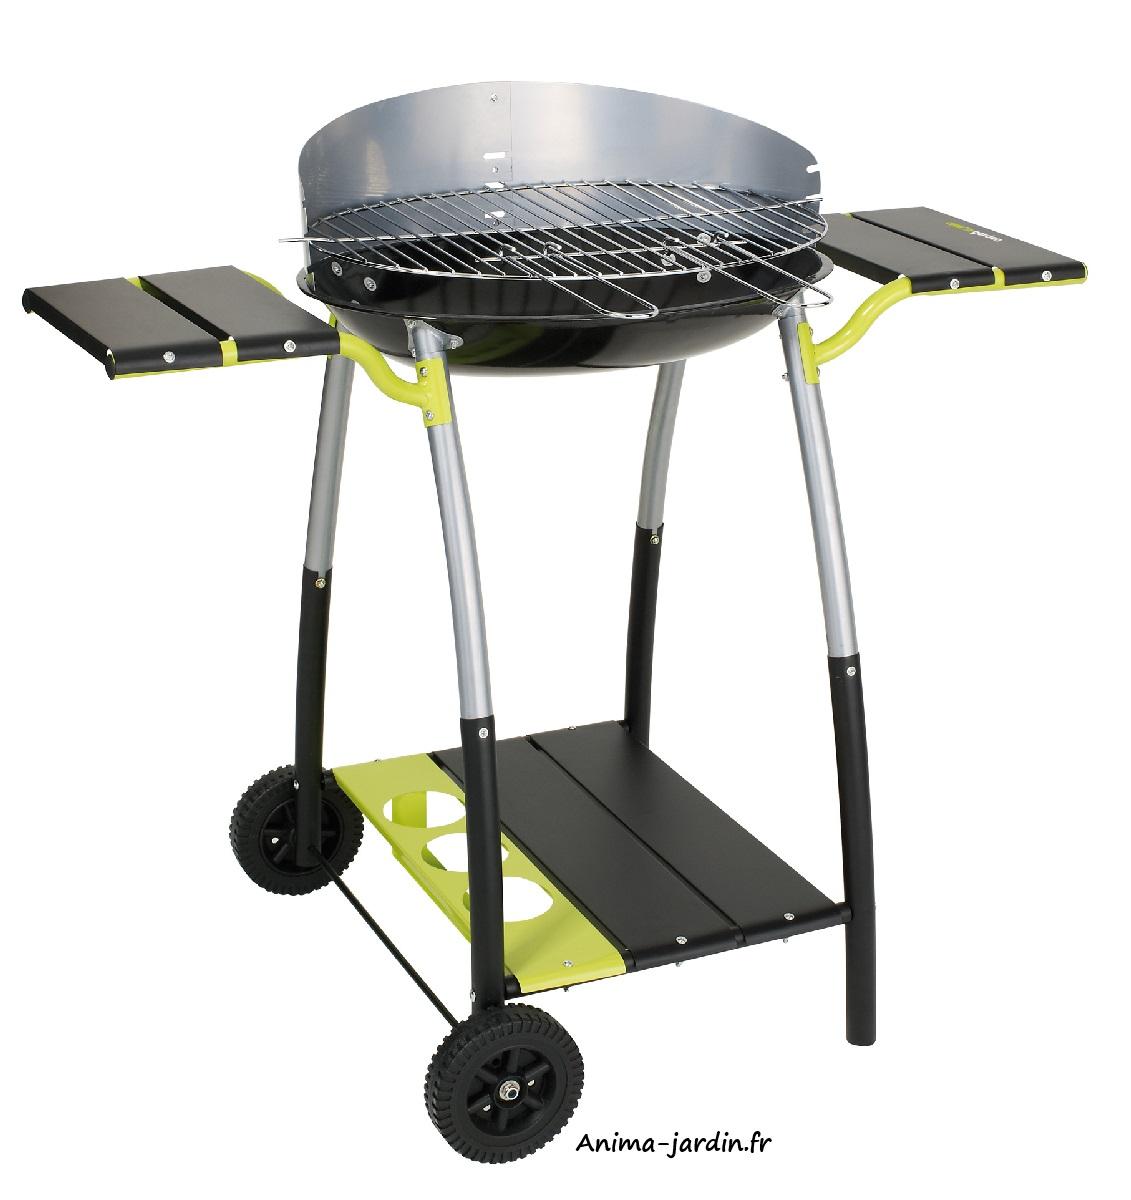 Barbecue-Charbon-CURVI-XL-acier-anima-jardin.fr